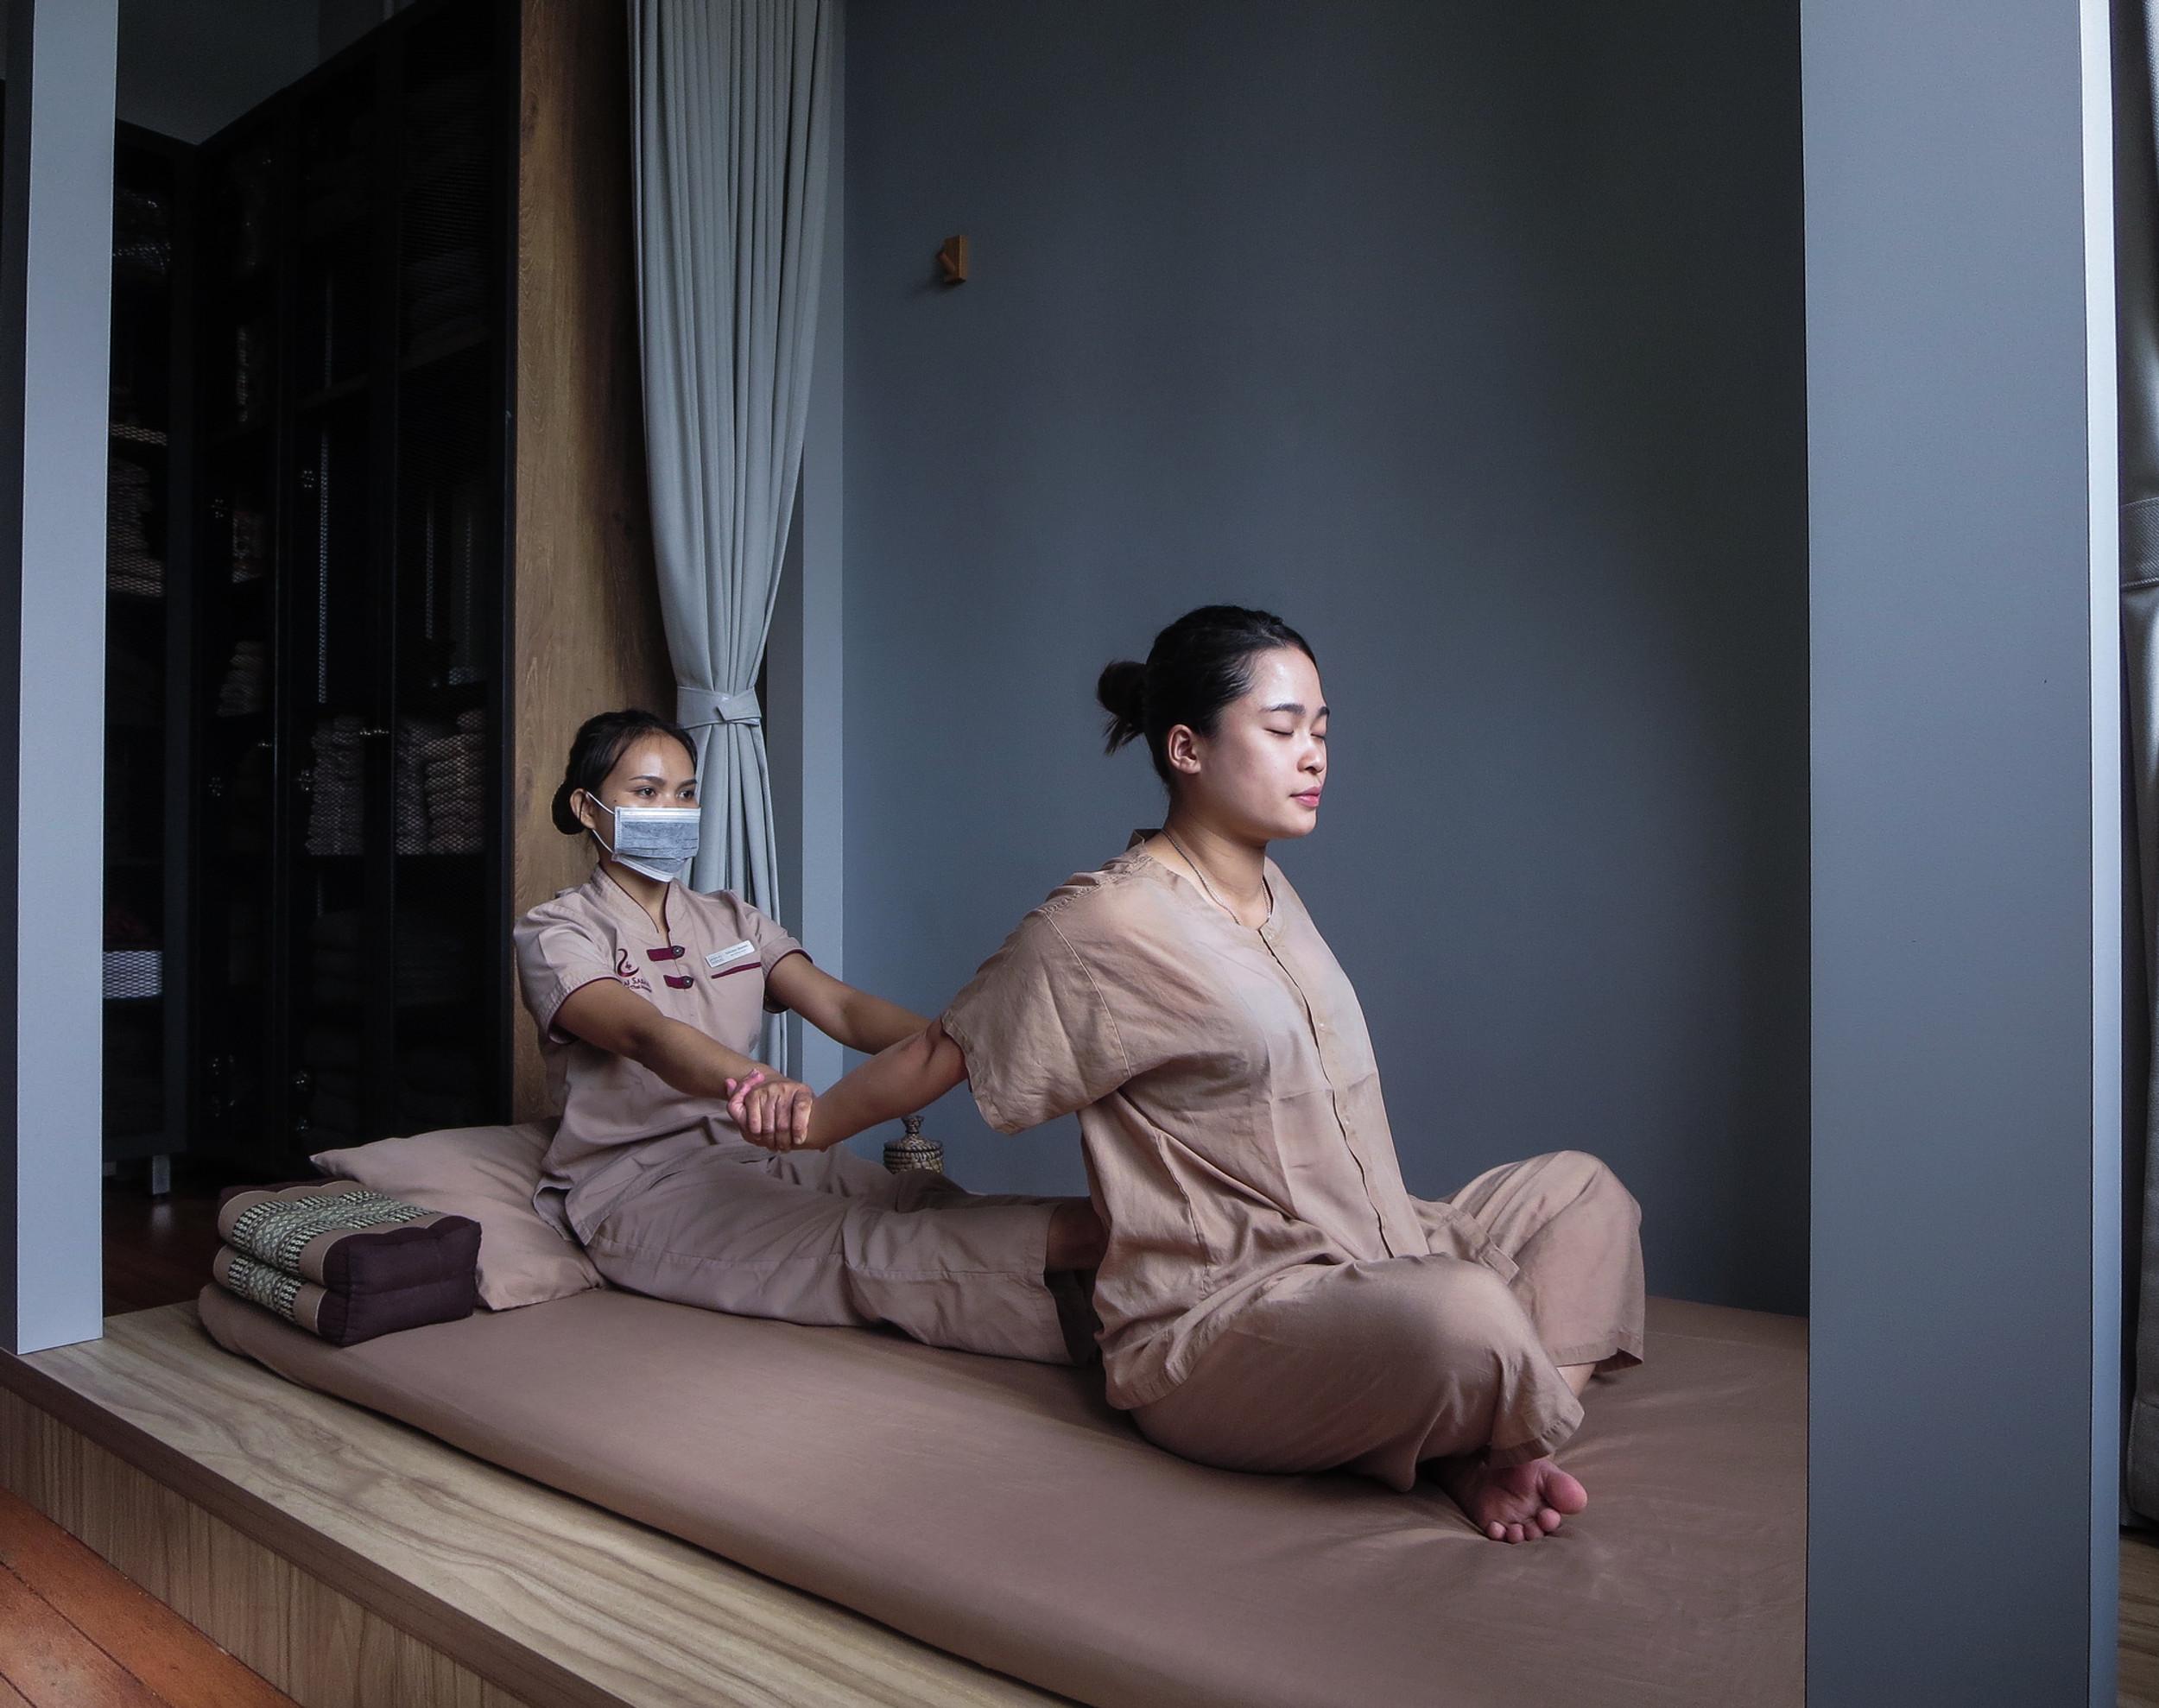 adult sensual massage escorte date no